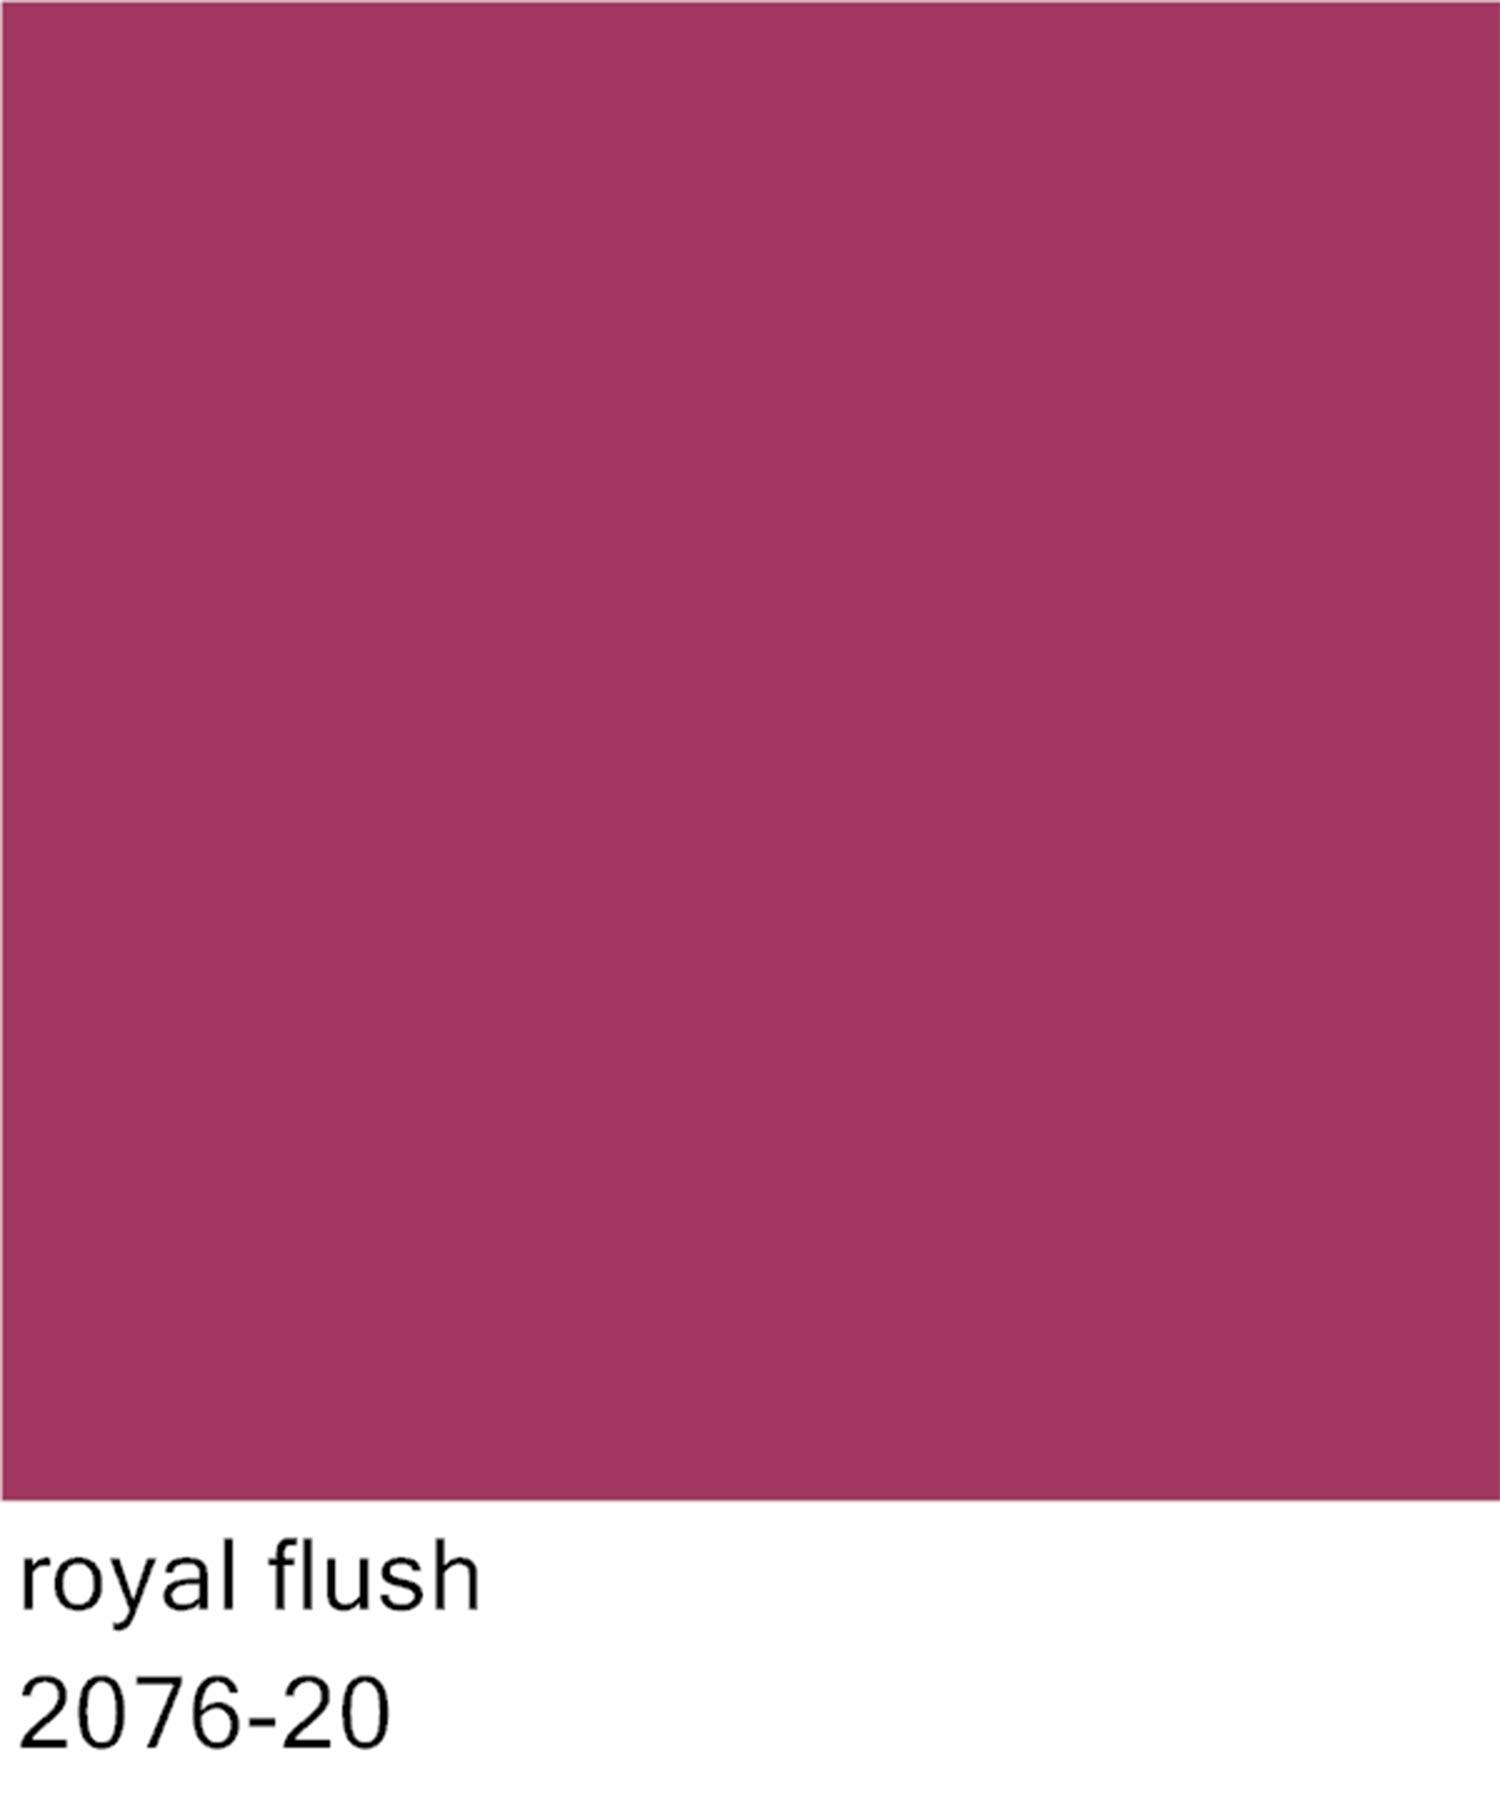 royalflush_2076-20-OPT.jpg